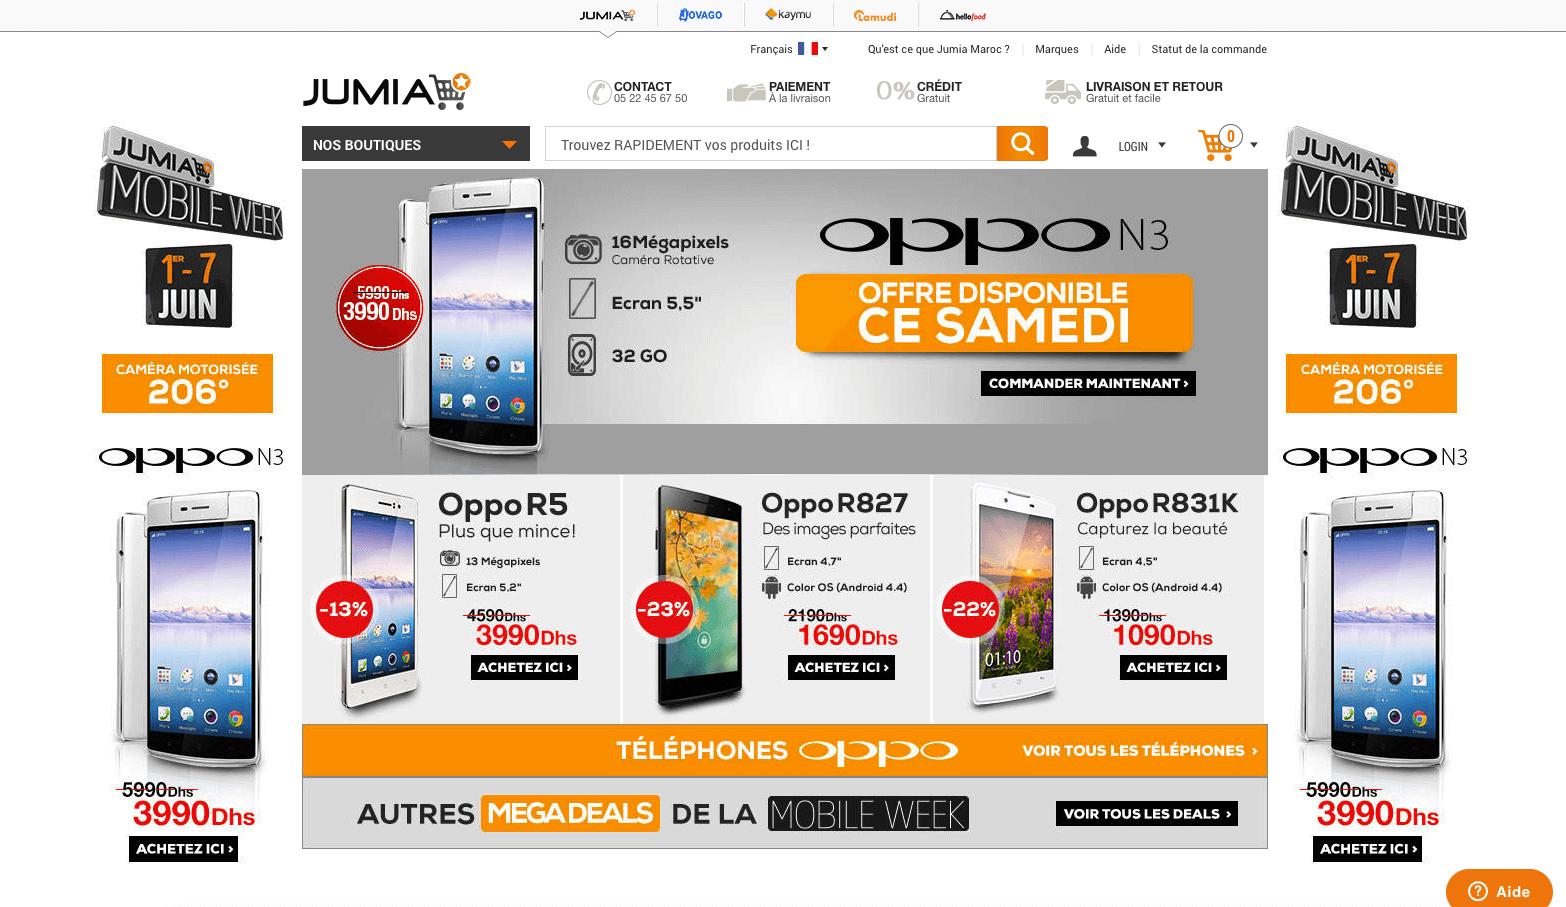 mobile-week-jumia